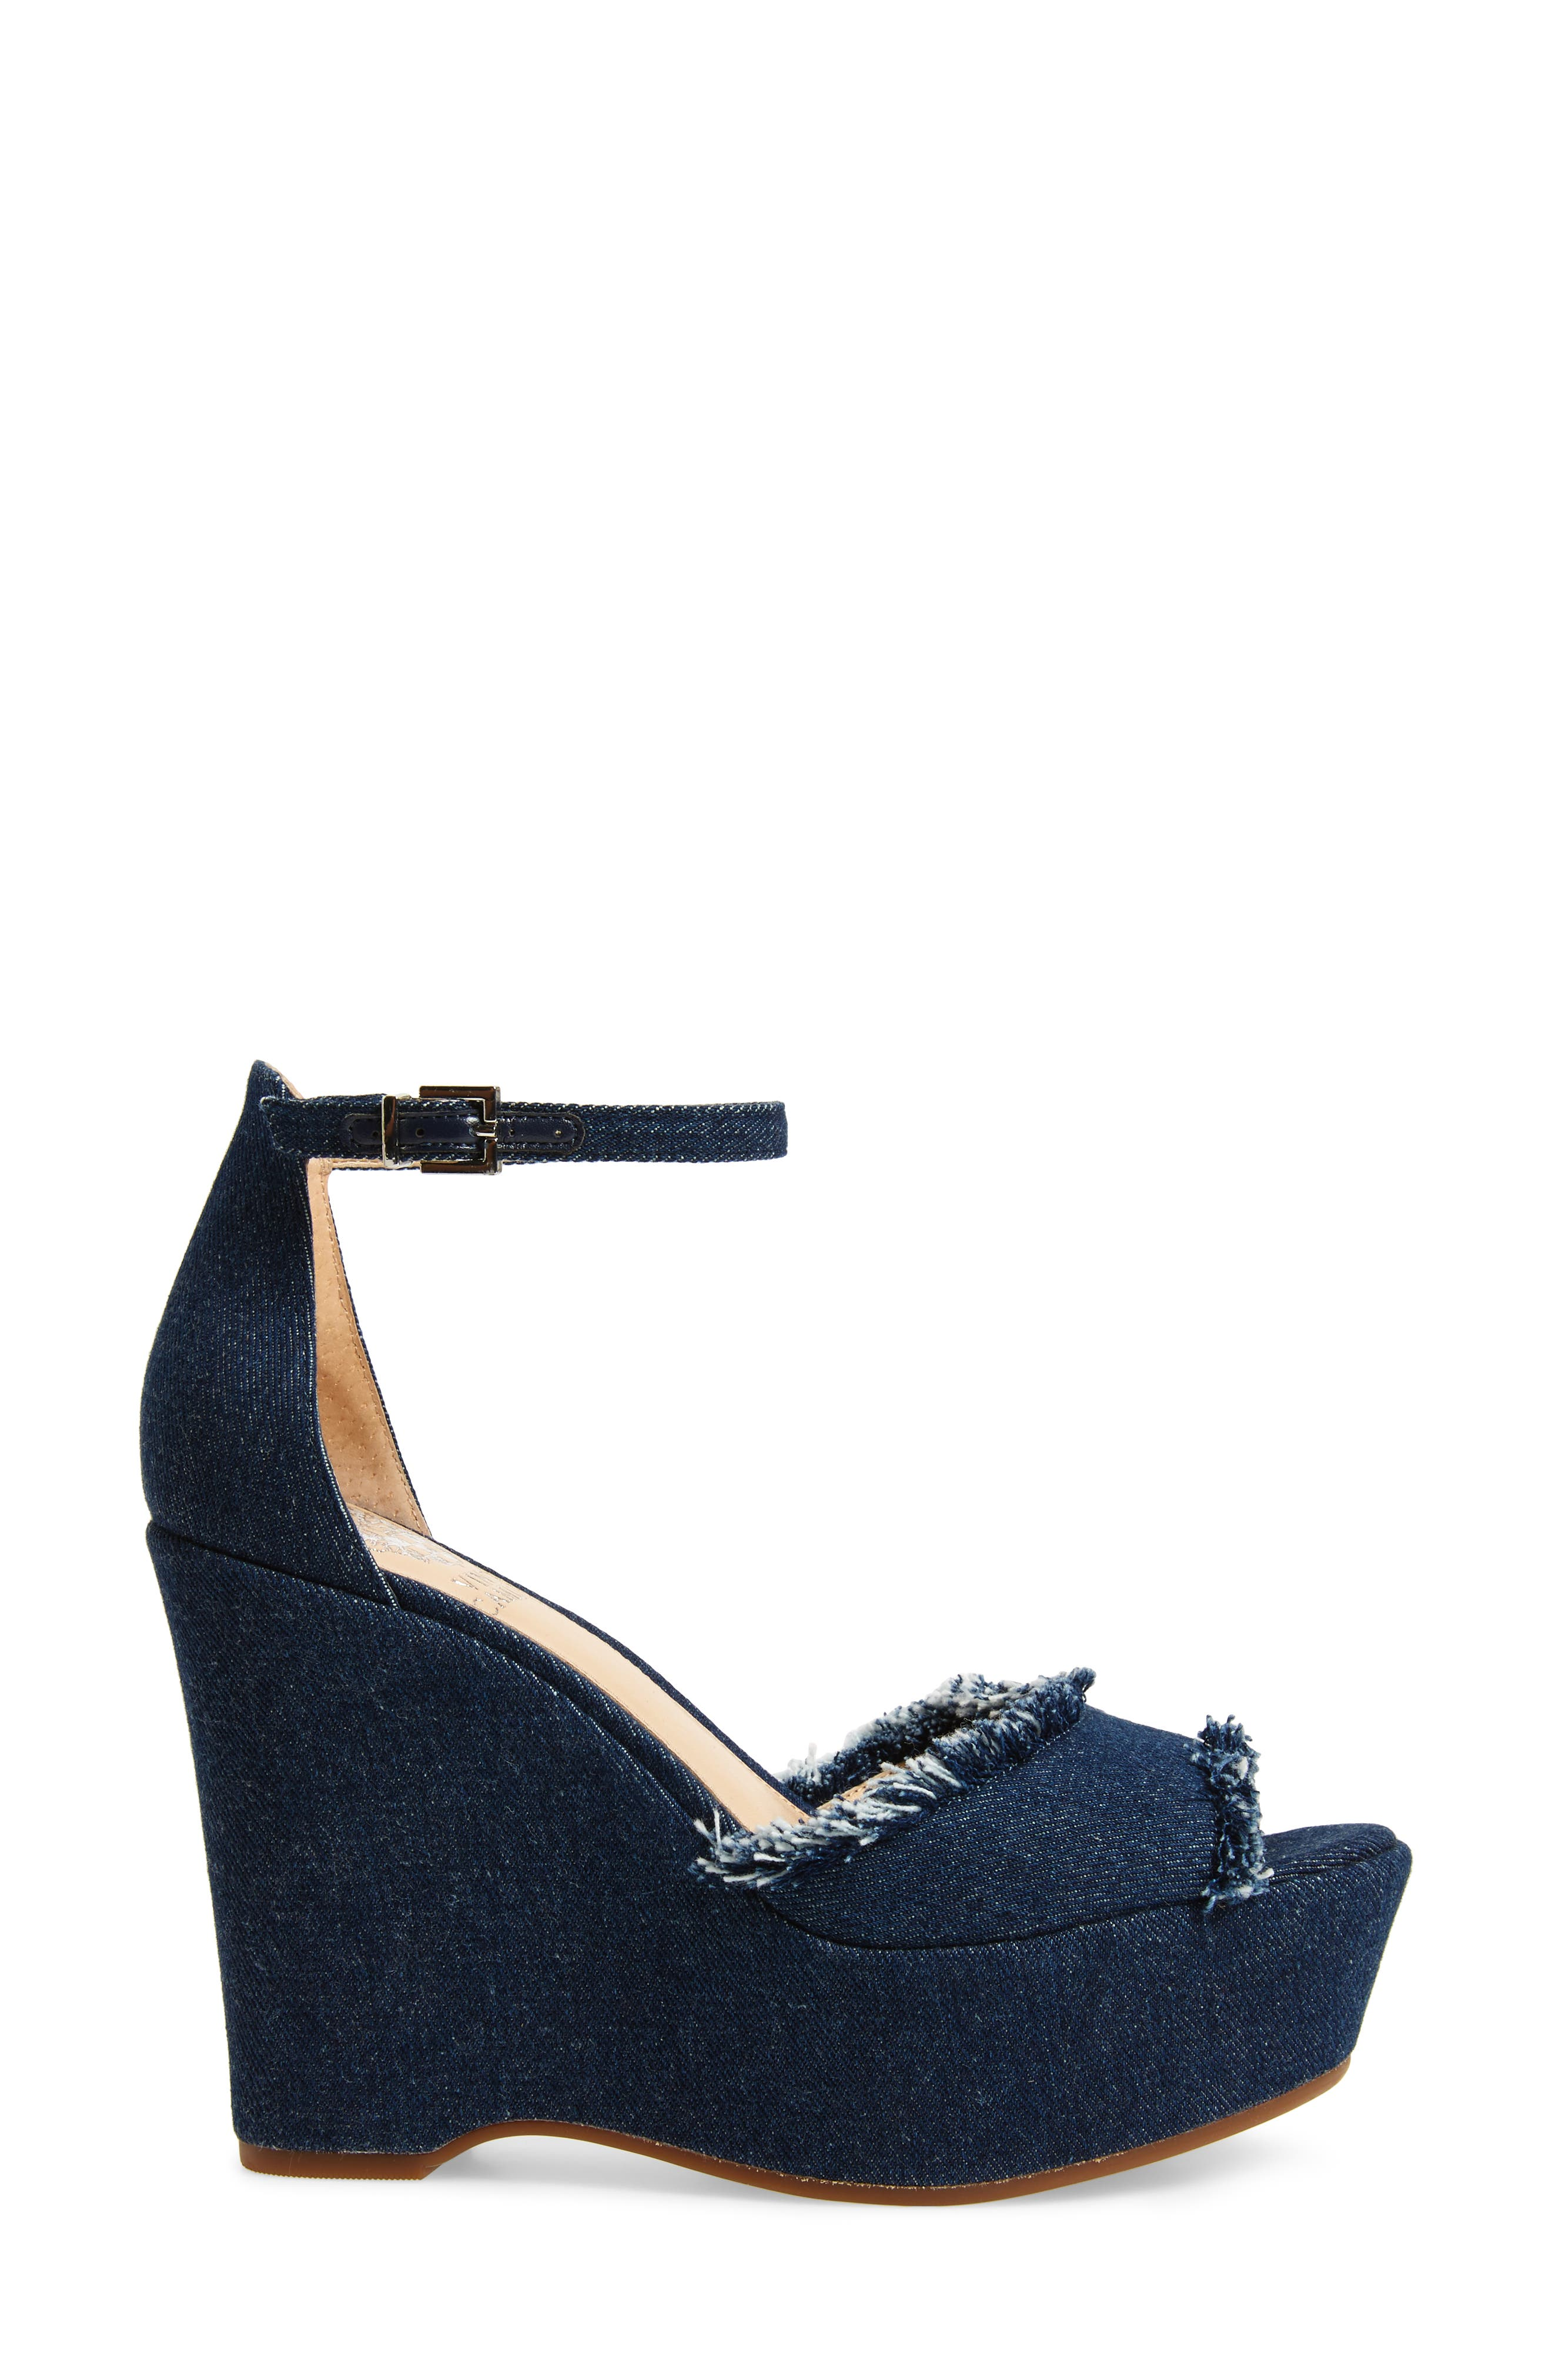 Tatchen Ankle Strap Platform Sandal,                             Alternate thumbnail 3, color,                             Dark Blue Denim